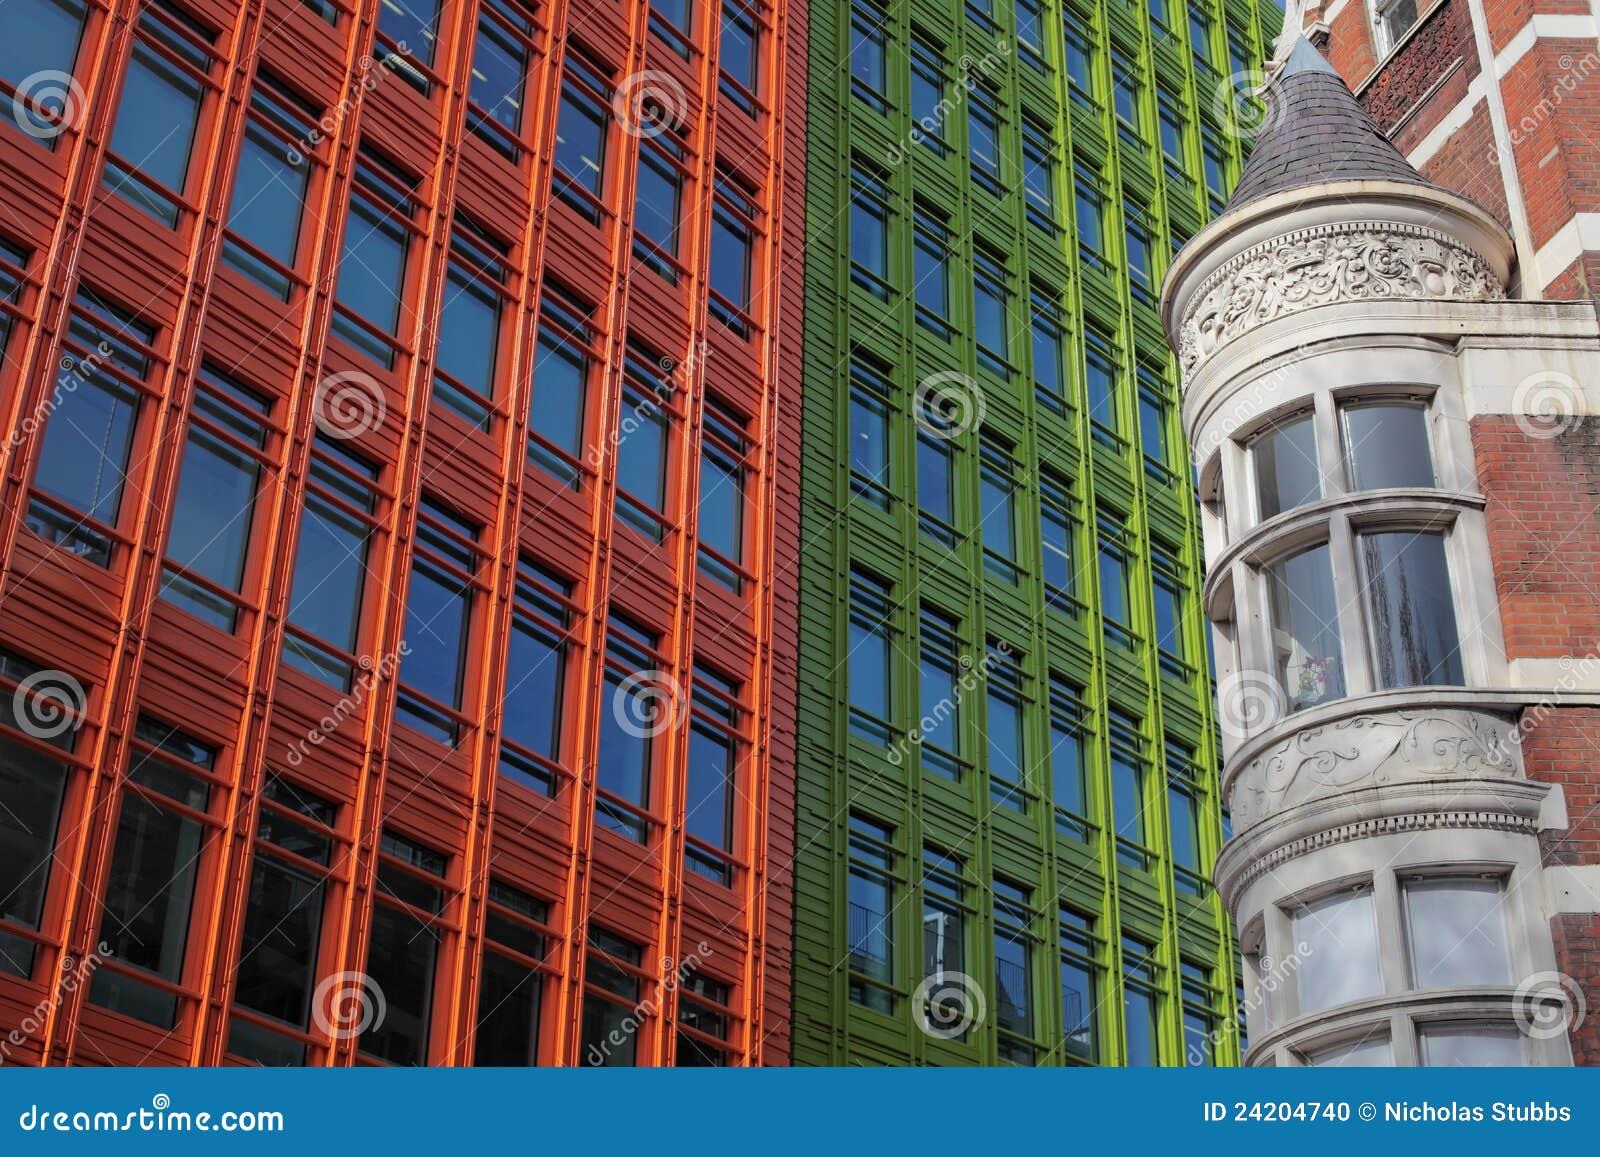 Historische en moderne architectuur in londen stock foto for Architecture moderne londres